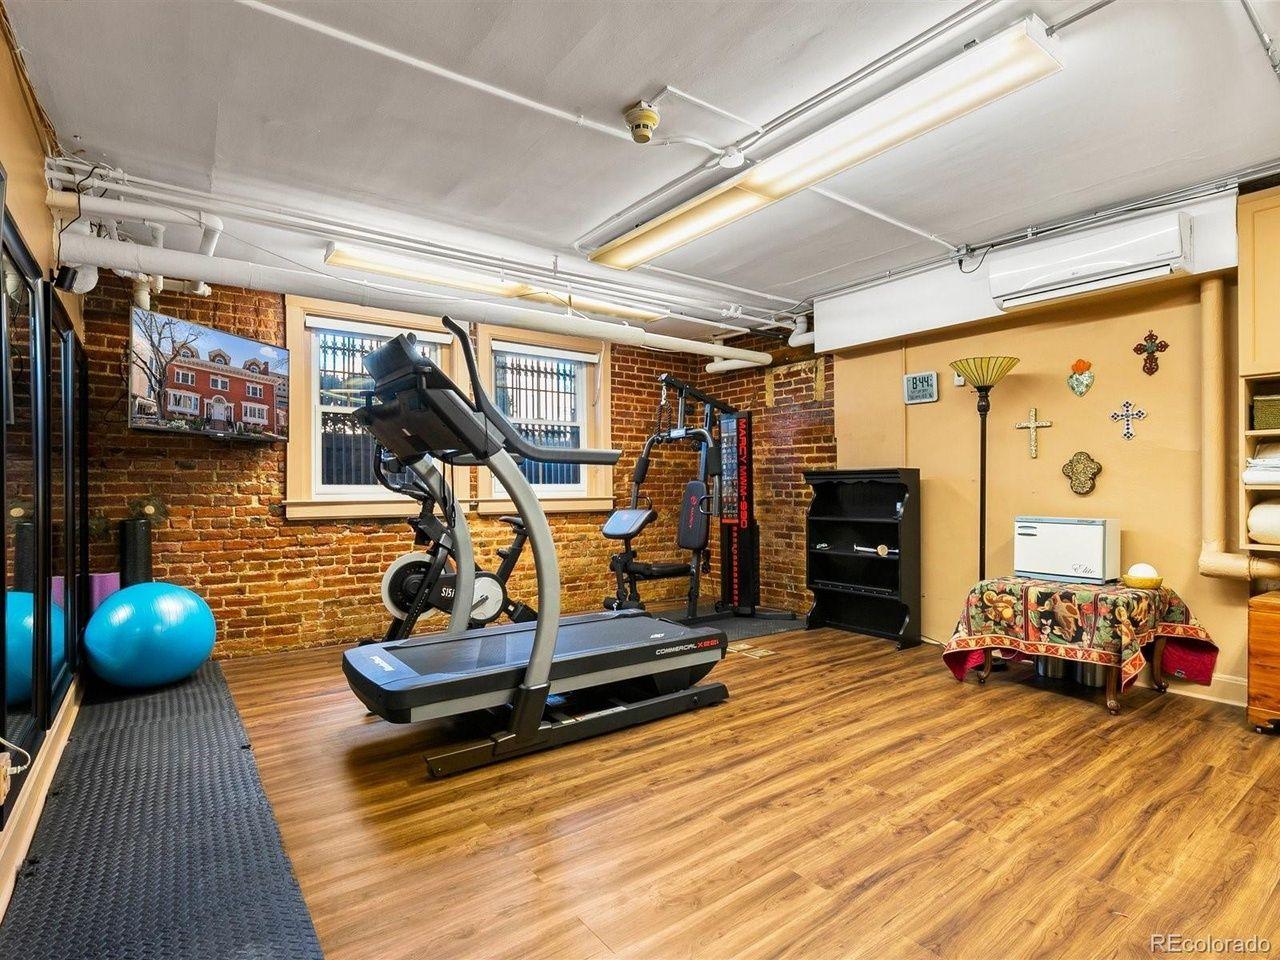 1350 N. Logan St home gym